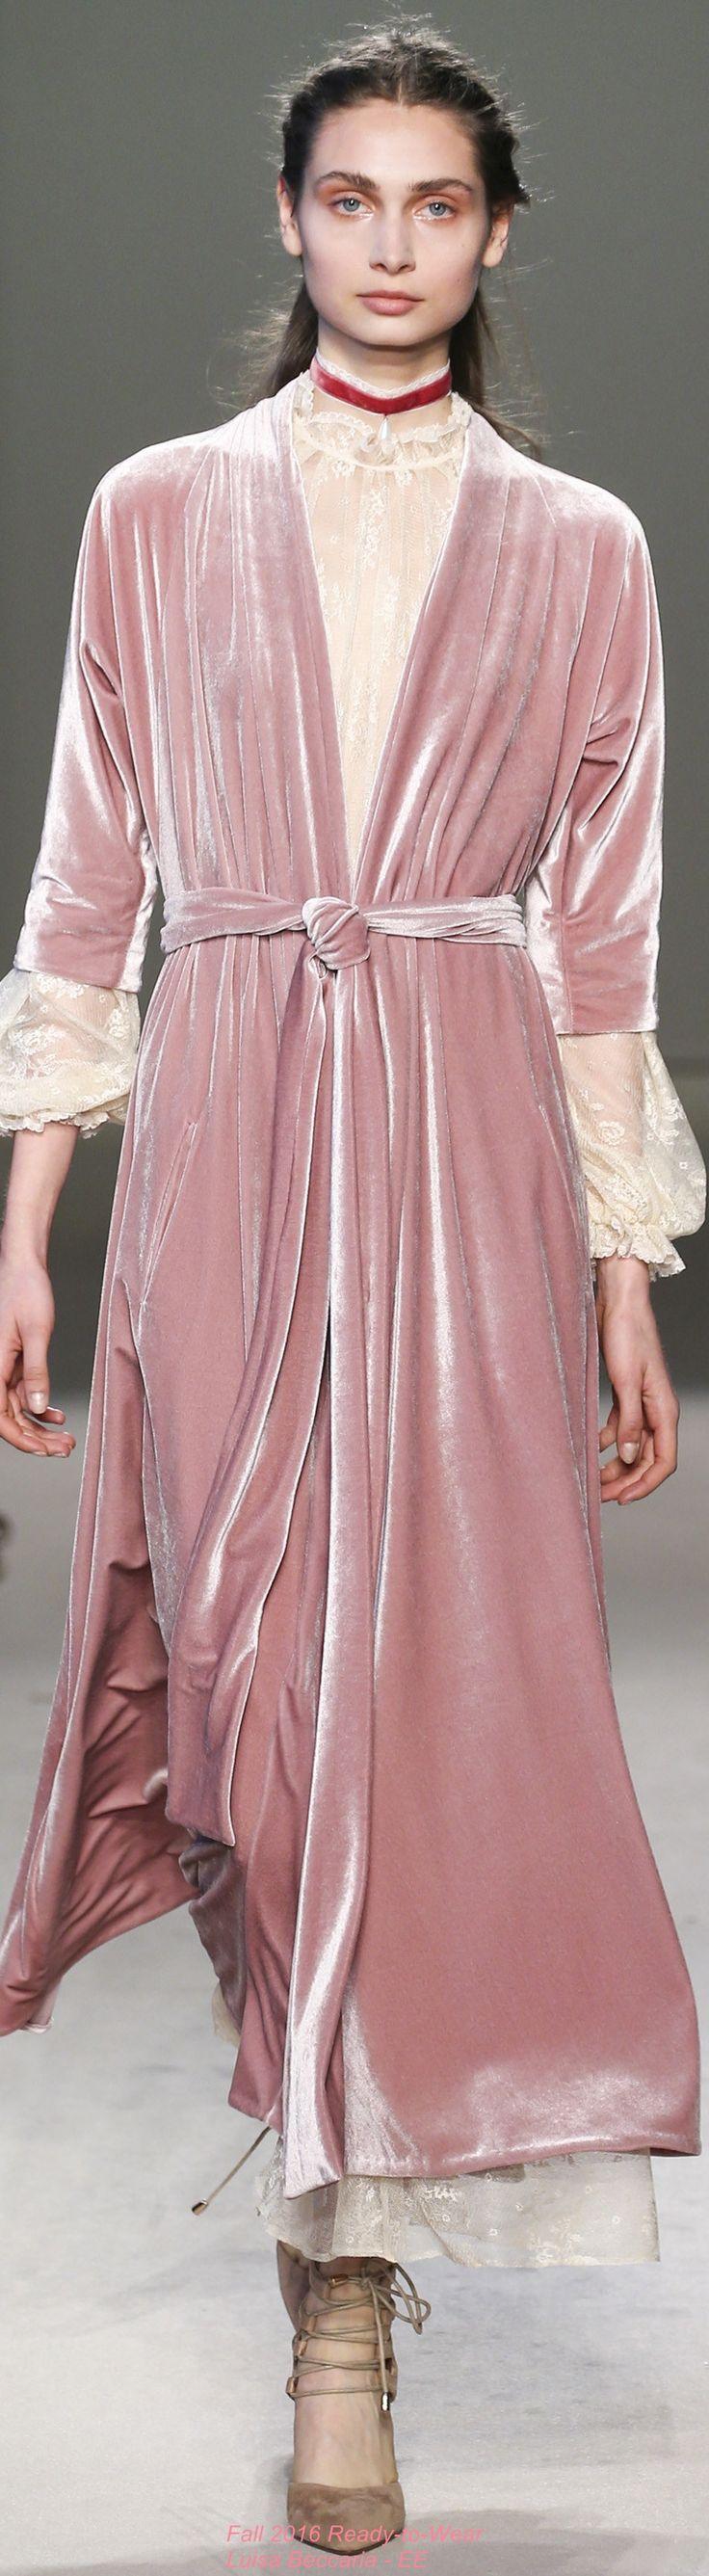 Fall 2016 Ready-to-Wear Luisa Beccaria